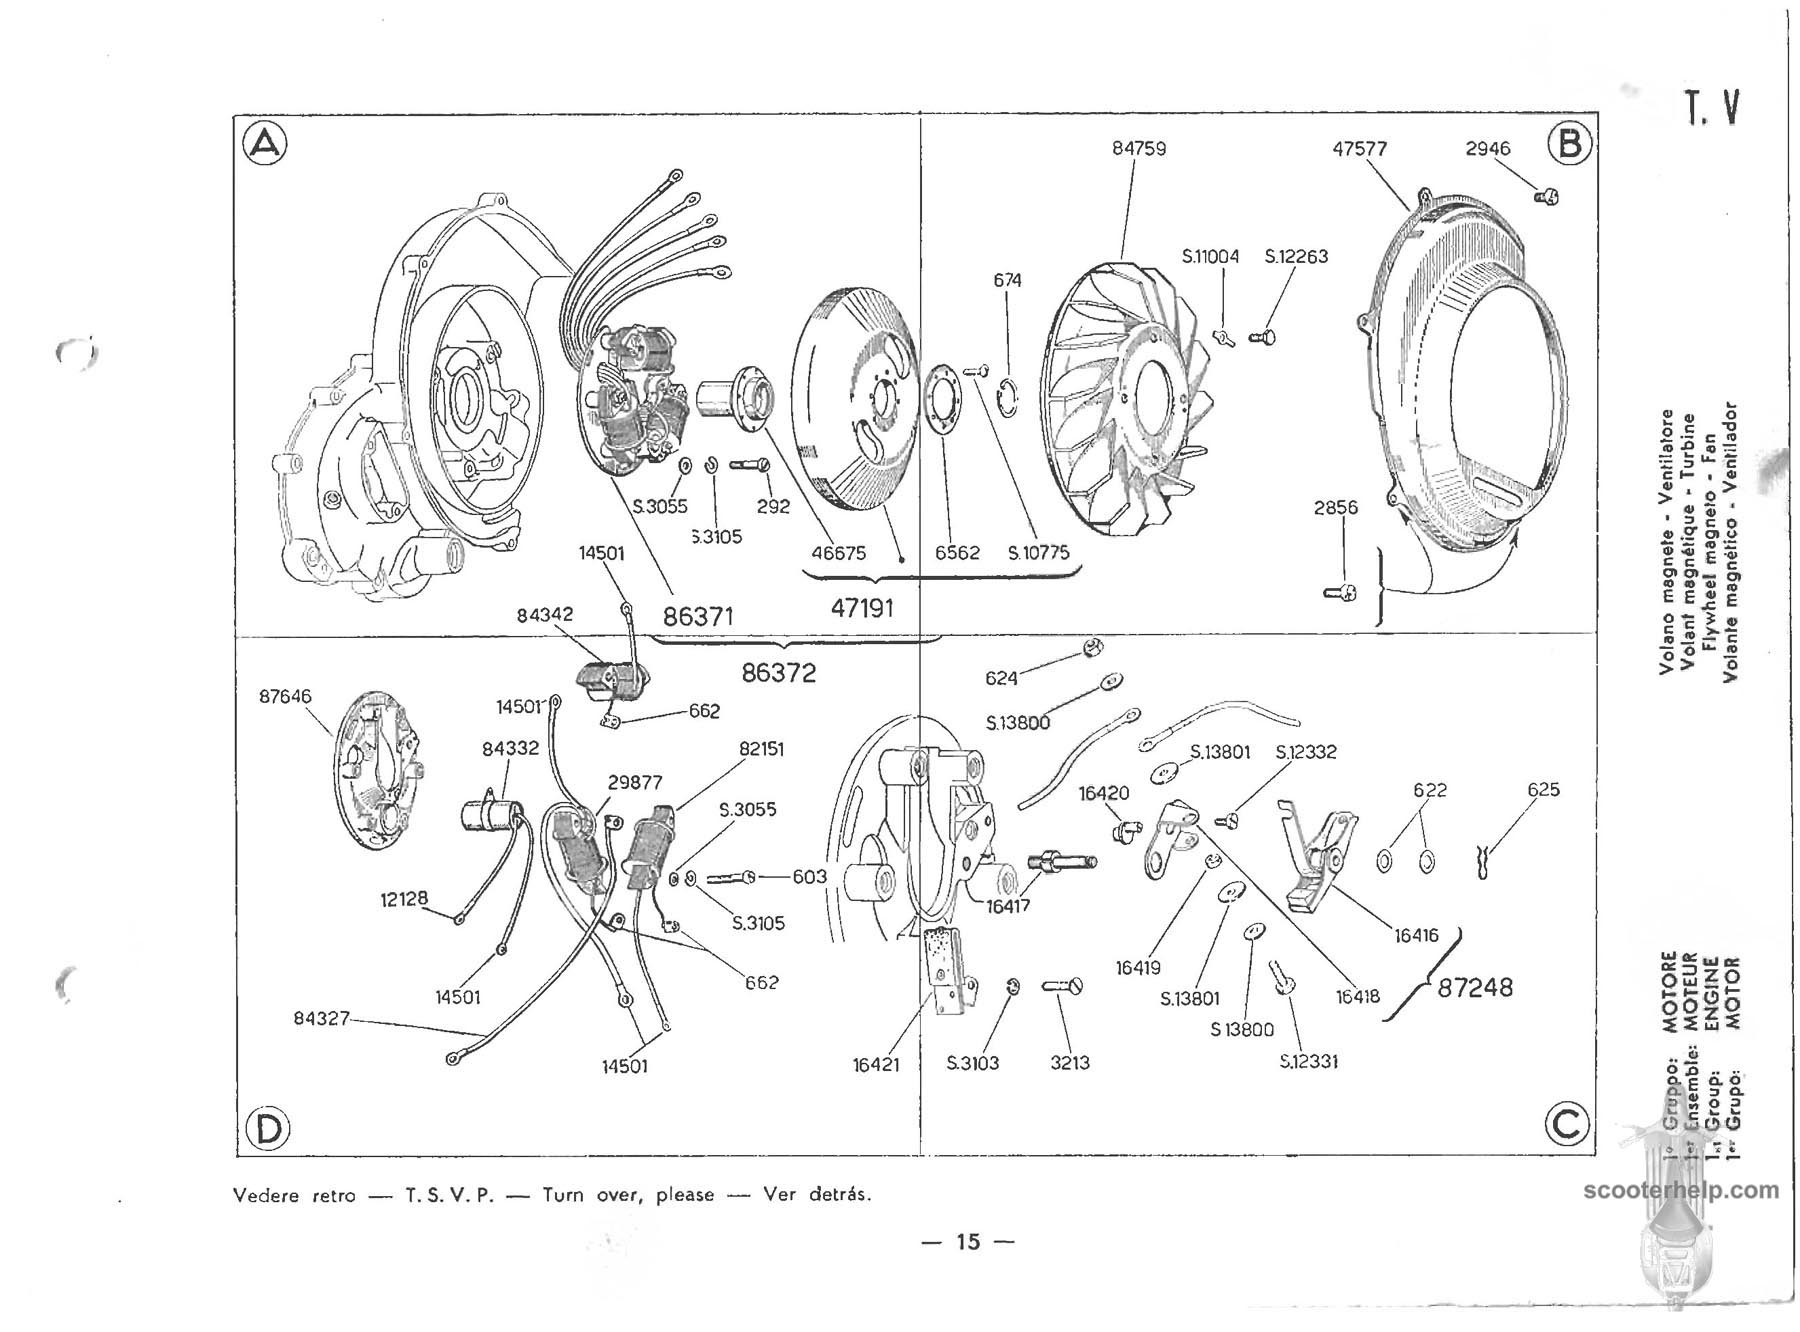 20 vespa 150 (vbb1t) parts manual,Vespa Sportique Wiring Diagram